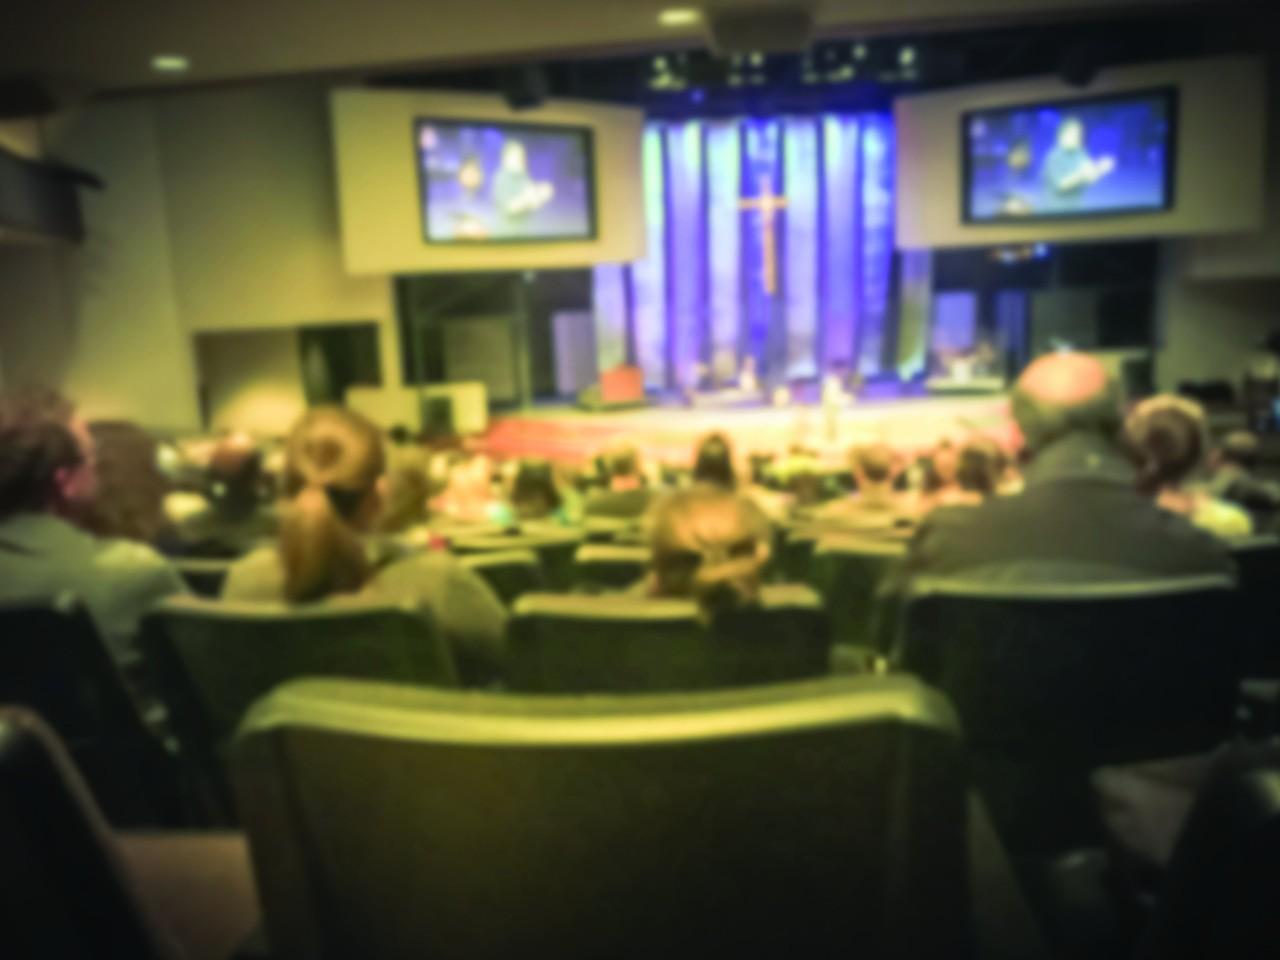 Text talk: Listening to a sermon